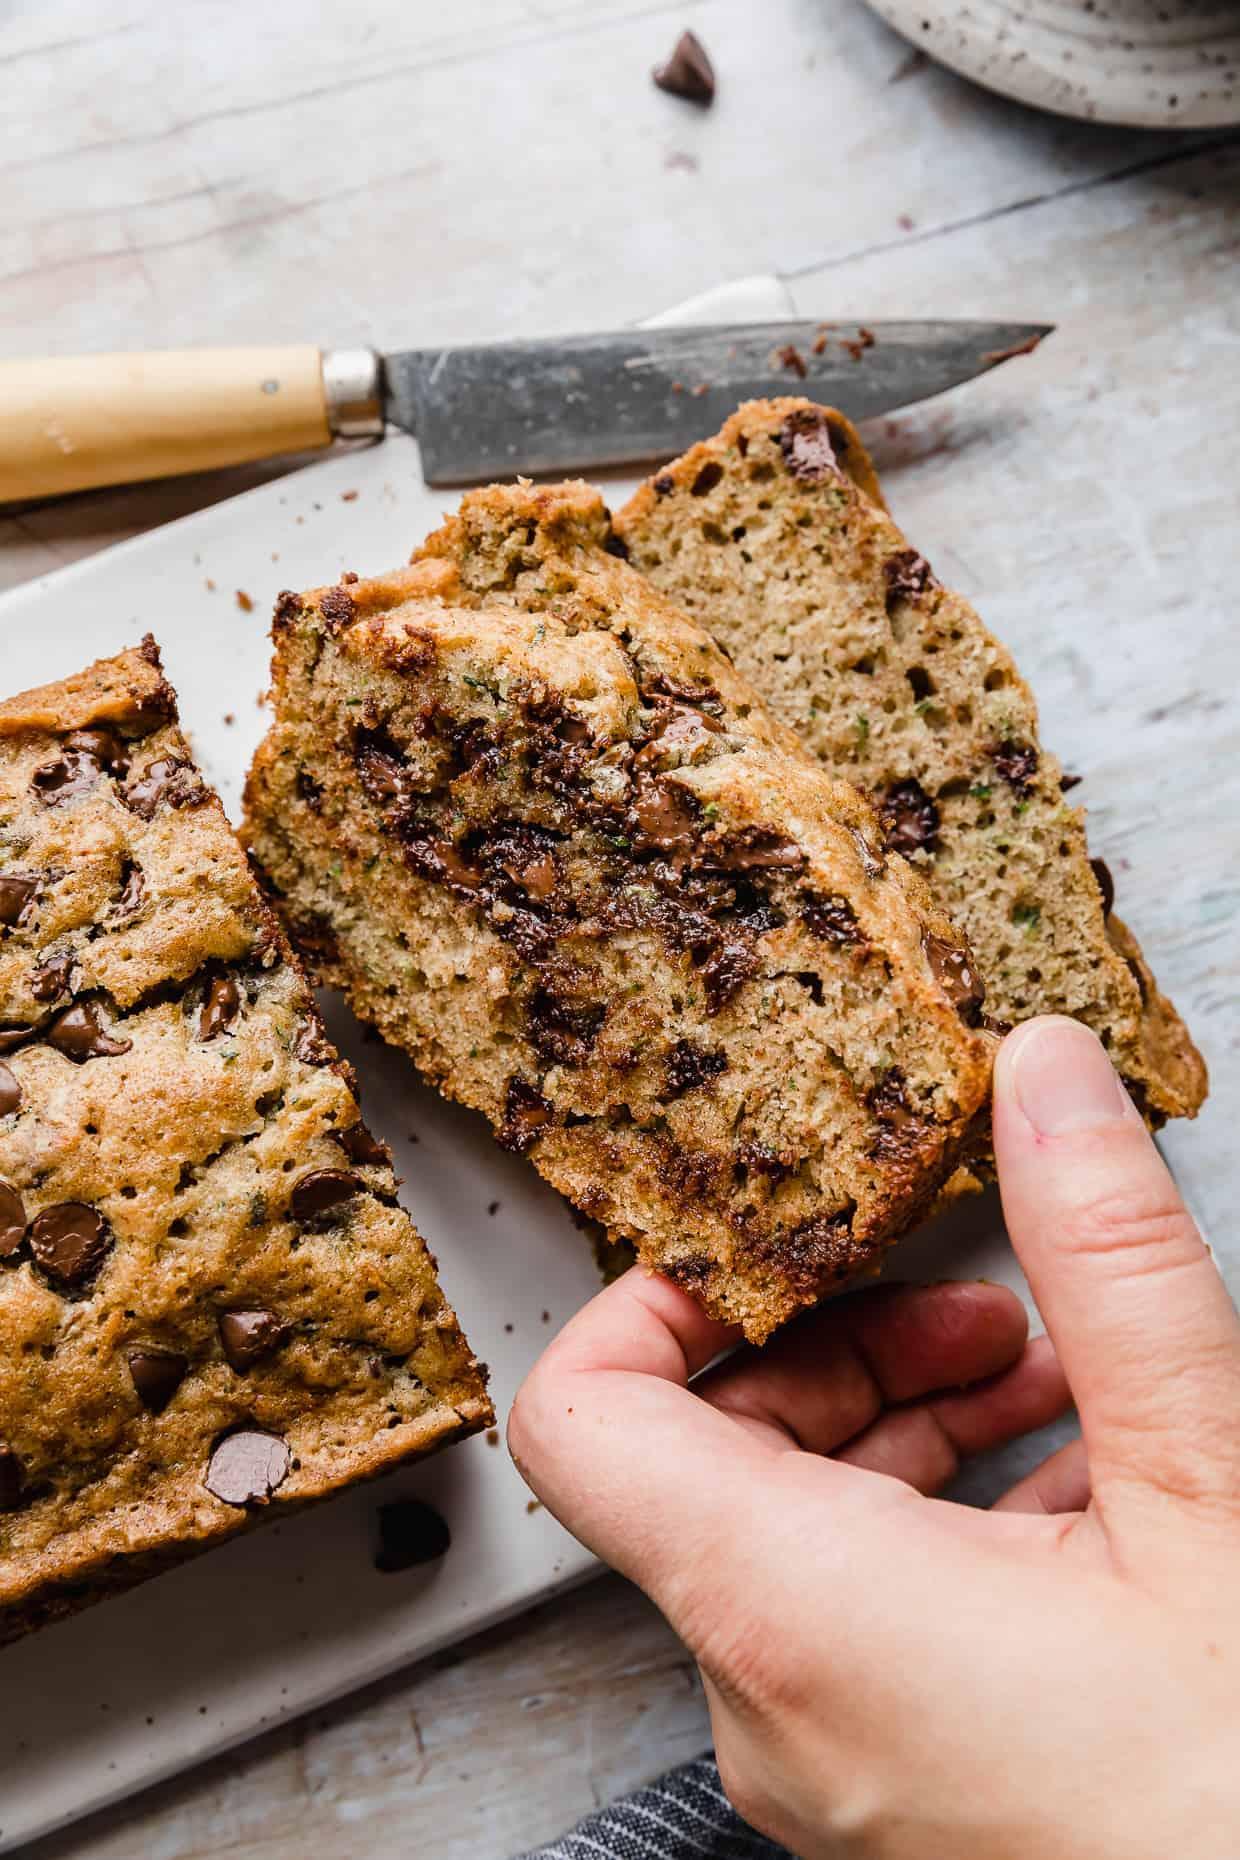 A hand grabbing a slice of chocolate chip zucchini bread.